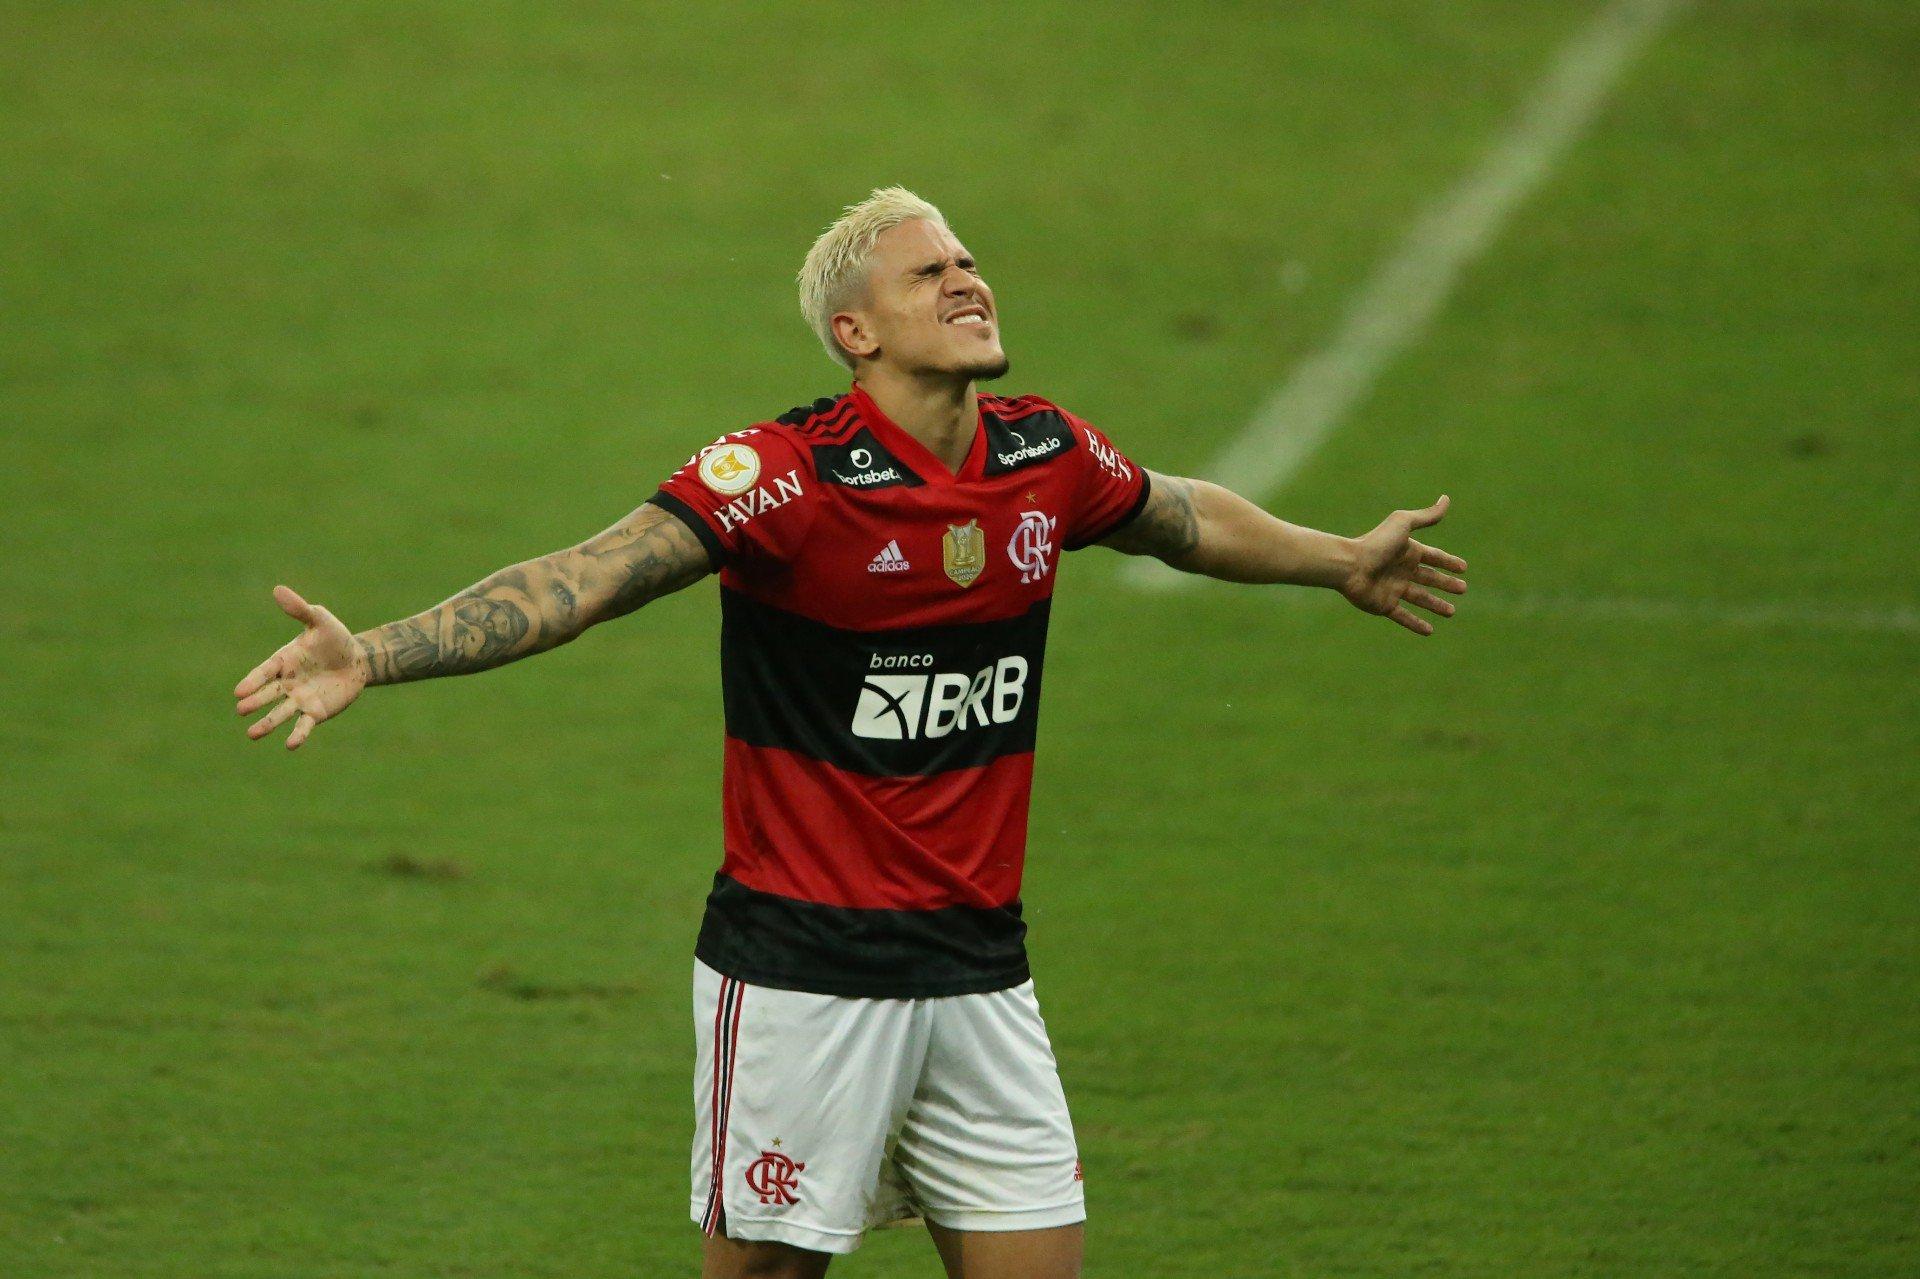 Pedro realiza cirurgia no joelho e inicia fisioterapia no Flamengo na quarta-feira